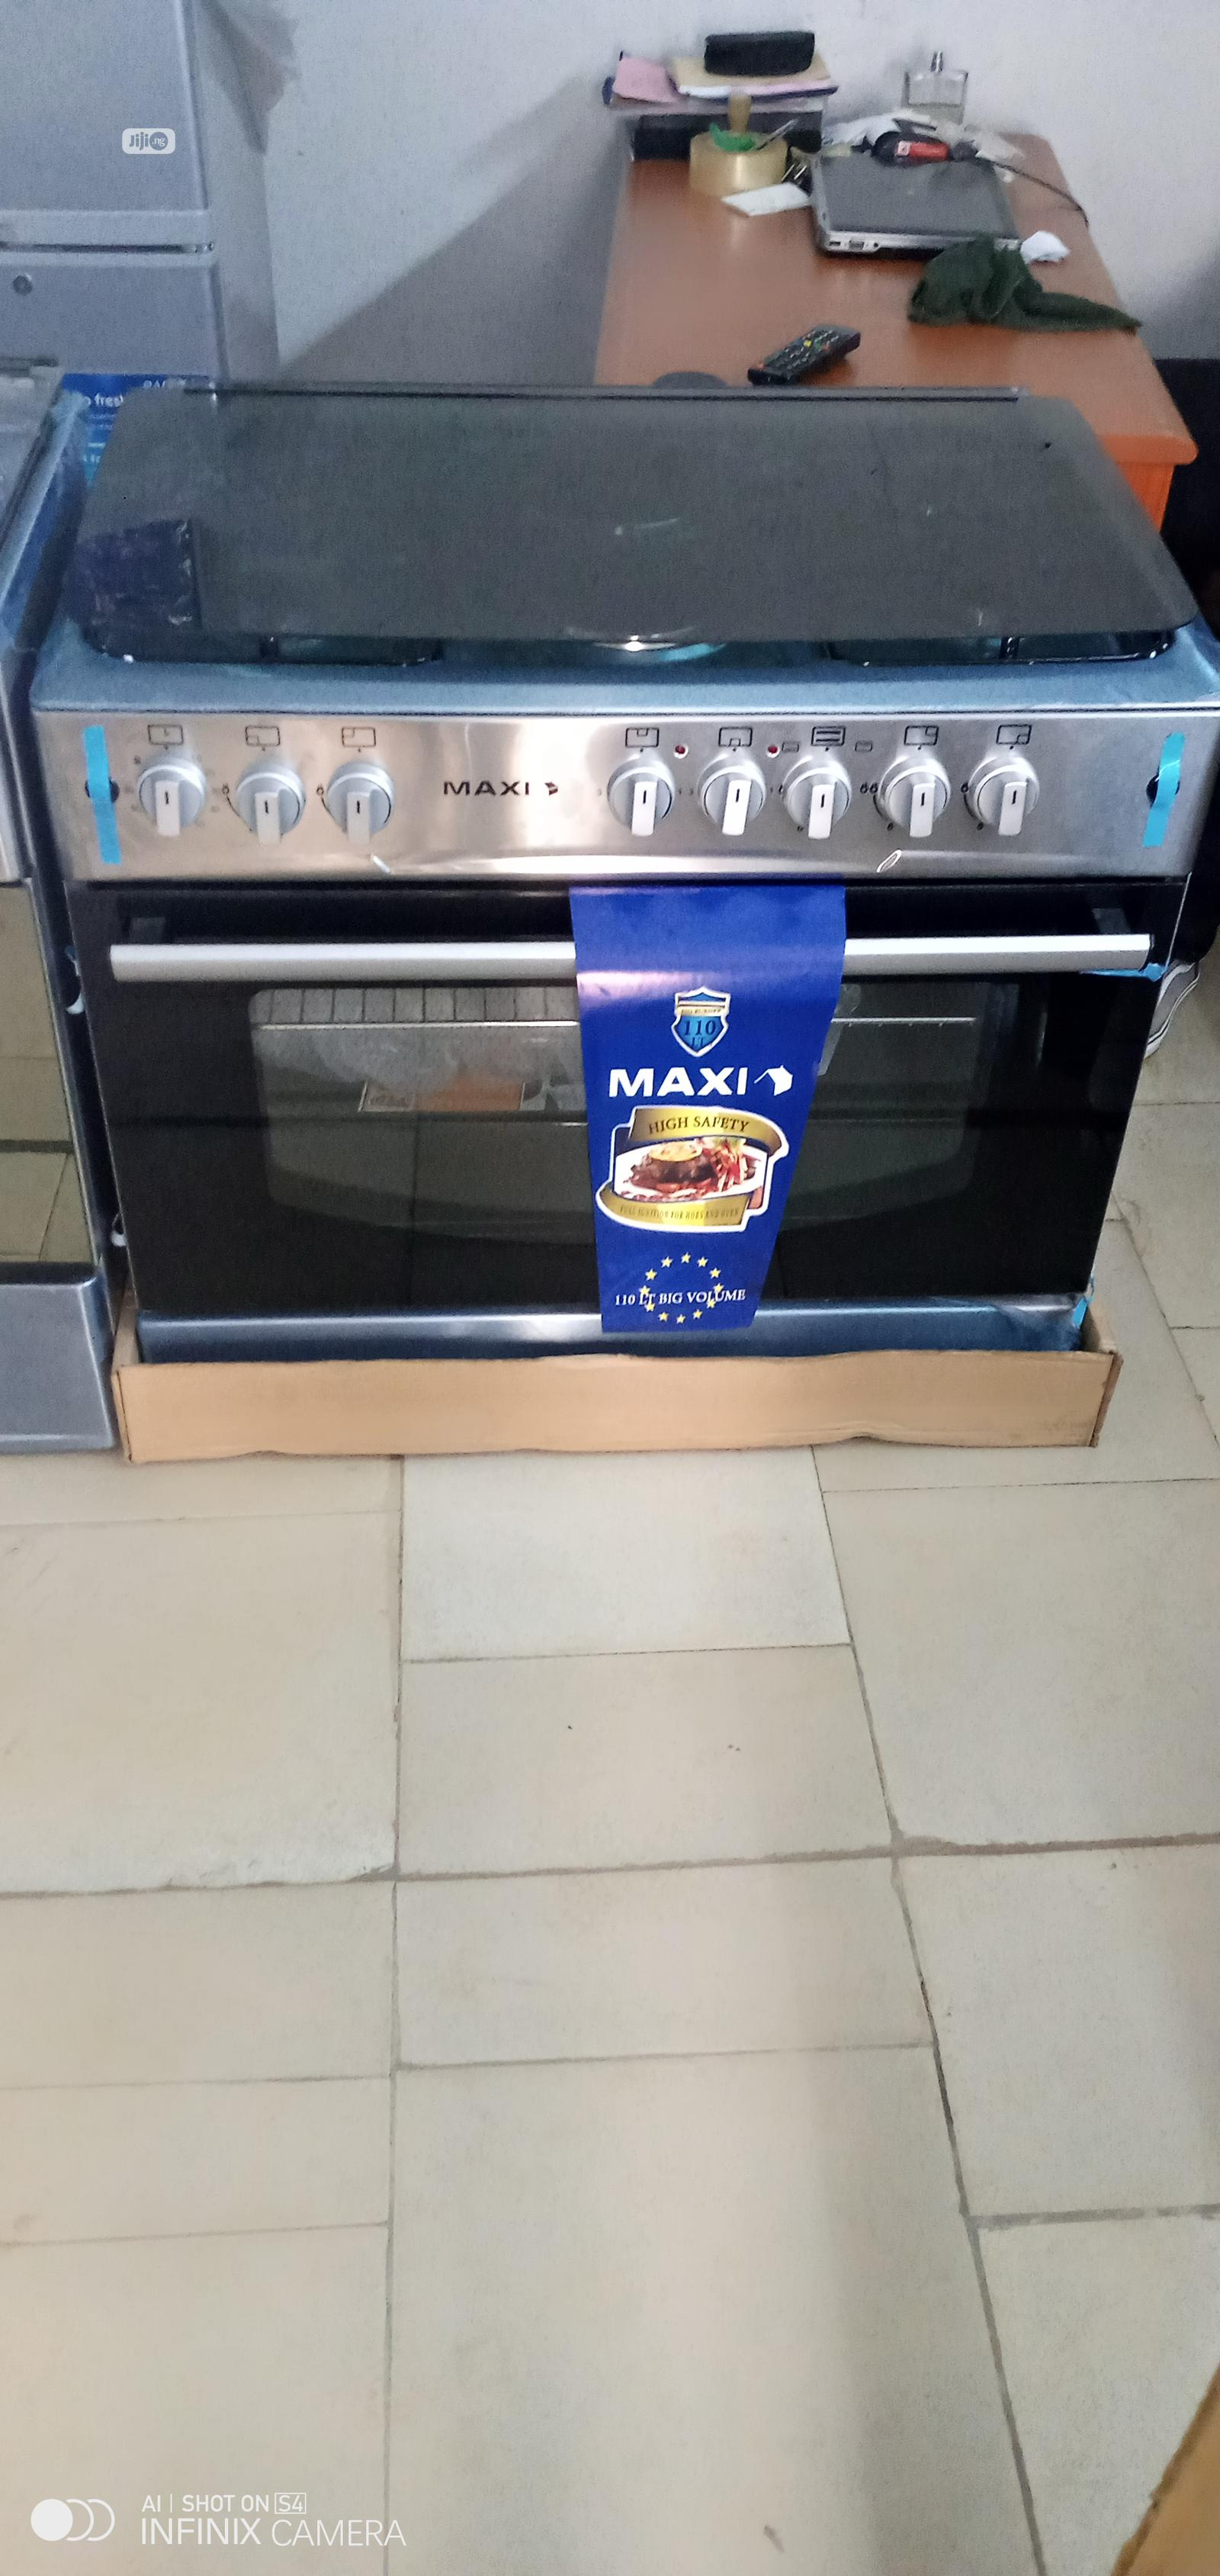 MAXI Gas Cooker MAXI60*90 (4+2) - Inox | Kitchen Appliances for sale in Benin City, Edo State, Nigeria